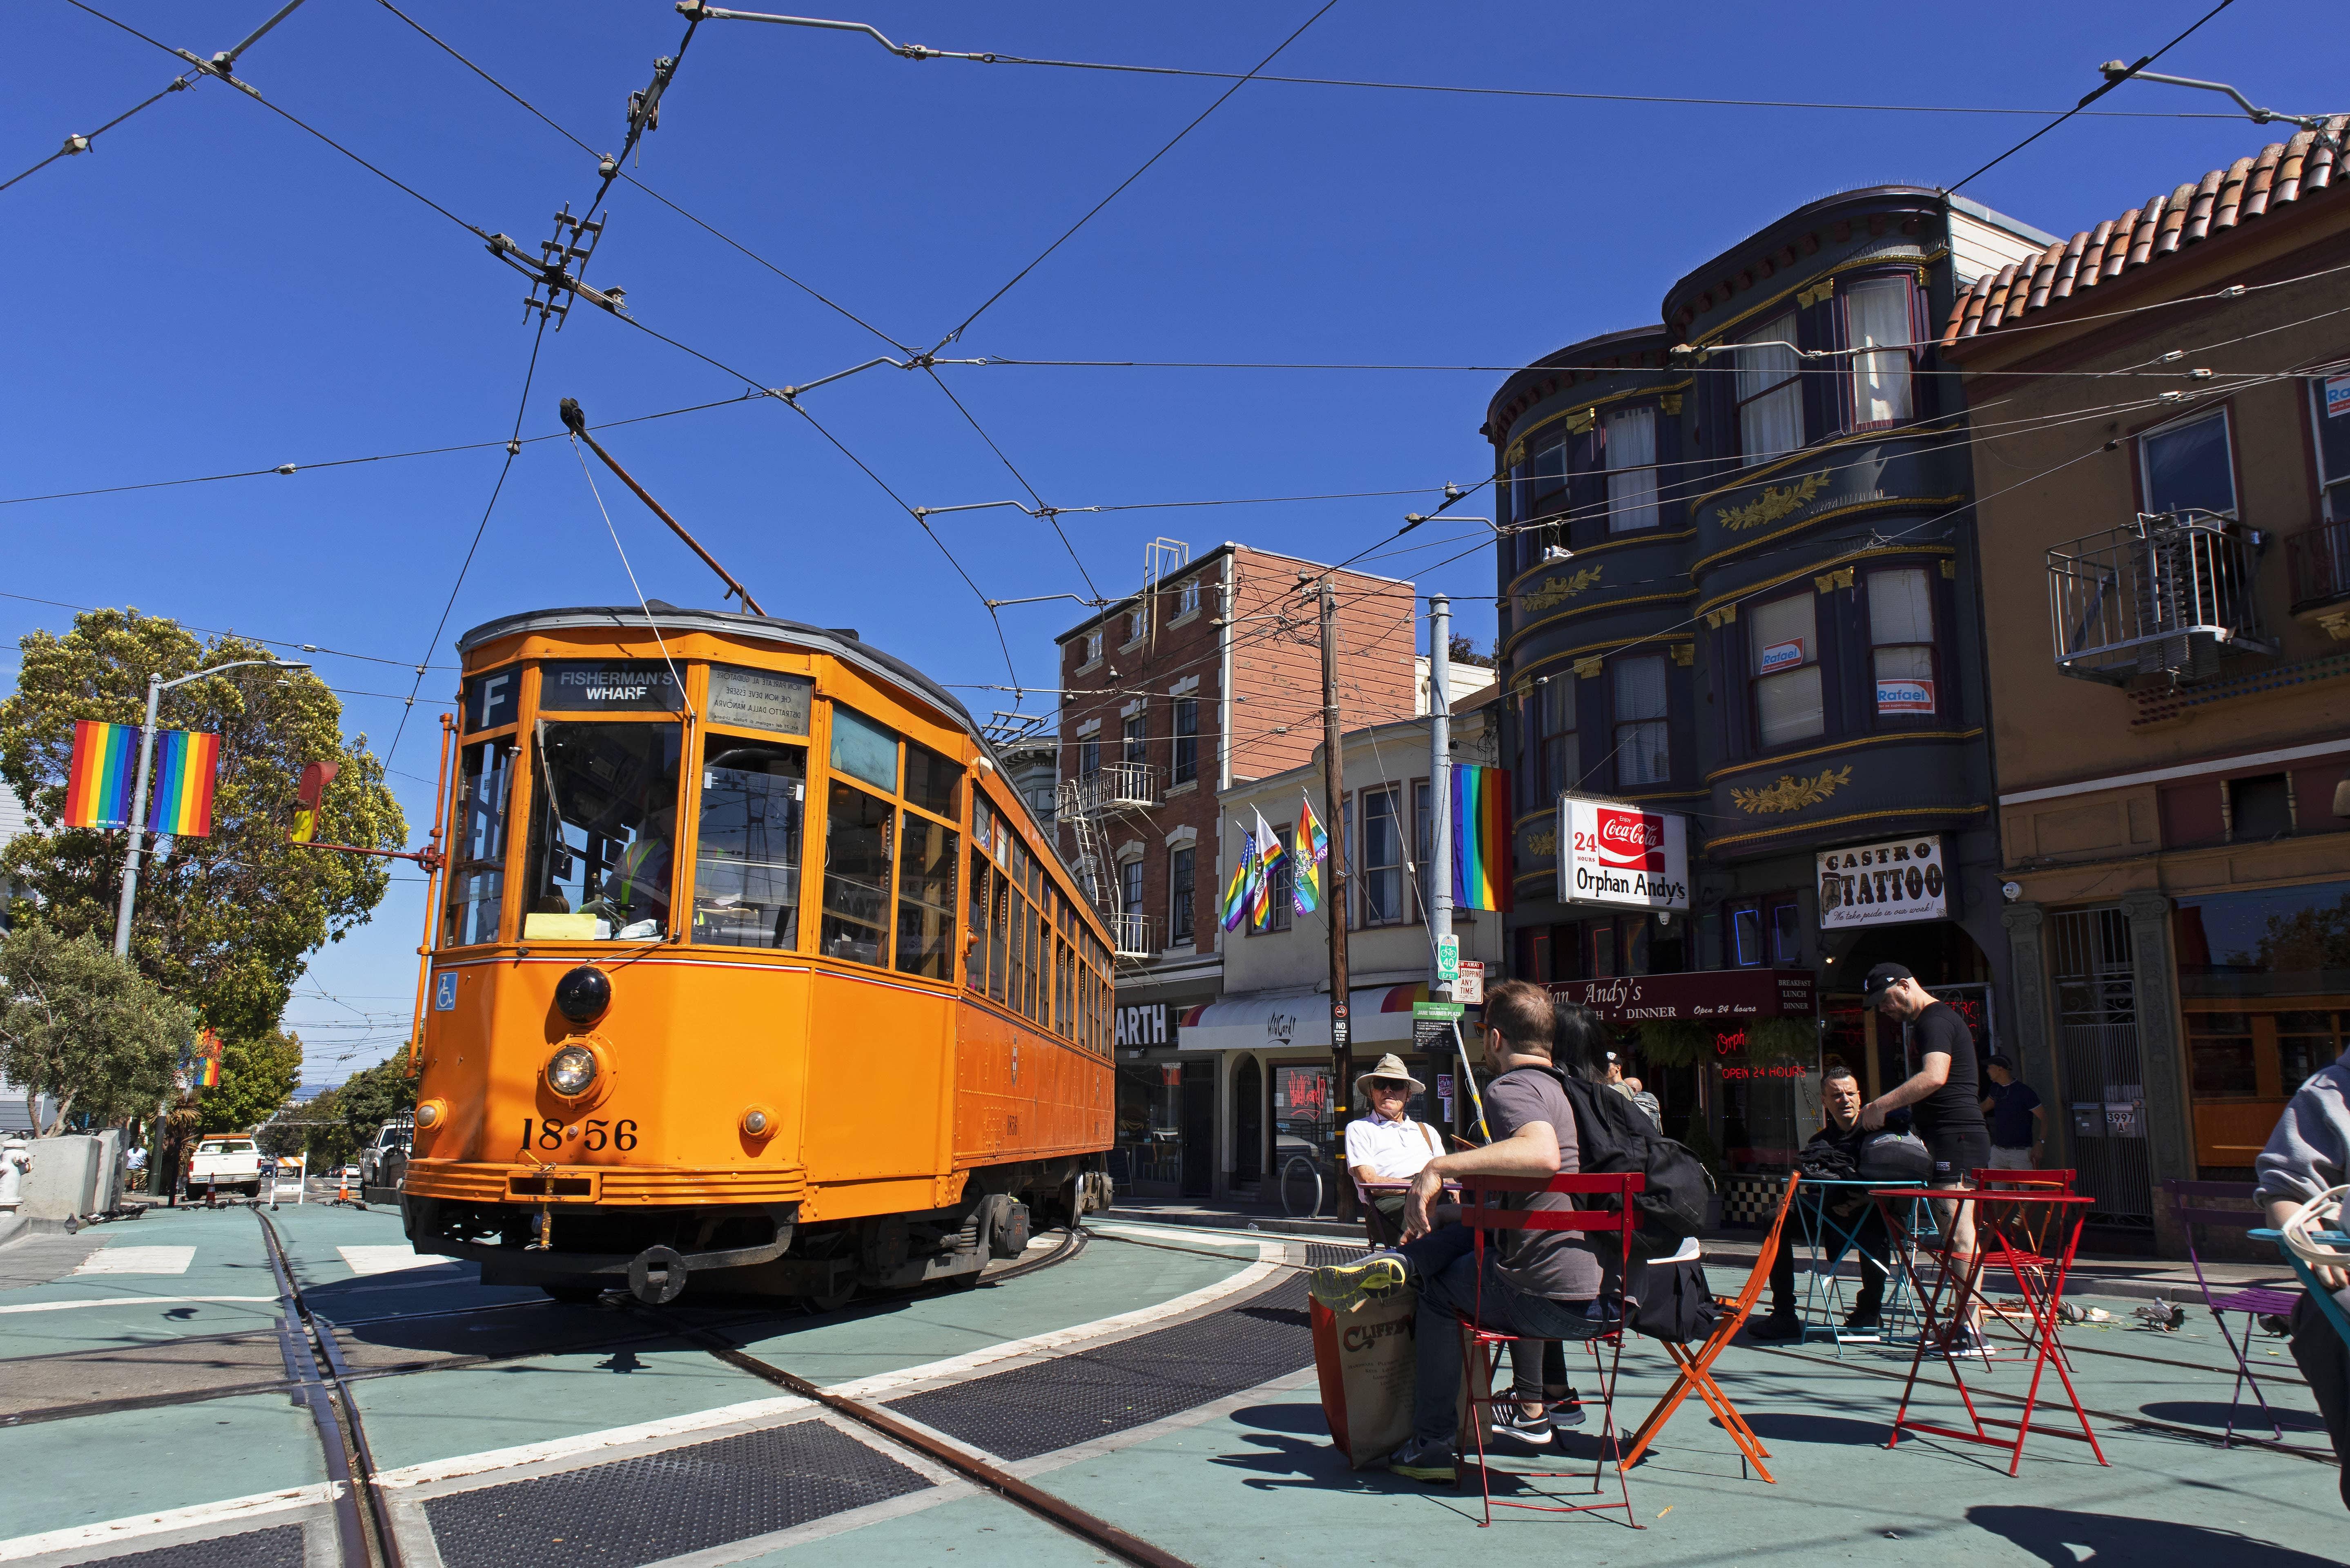 Photo of a streetcar in San Francisco's Castro neighborhood